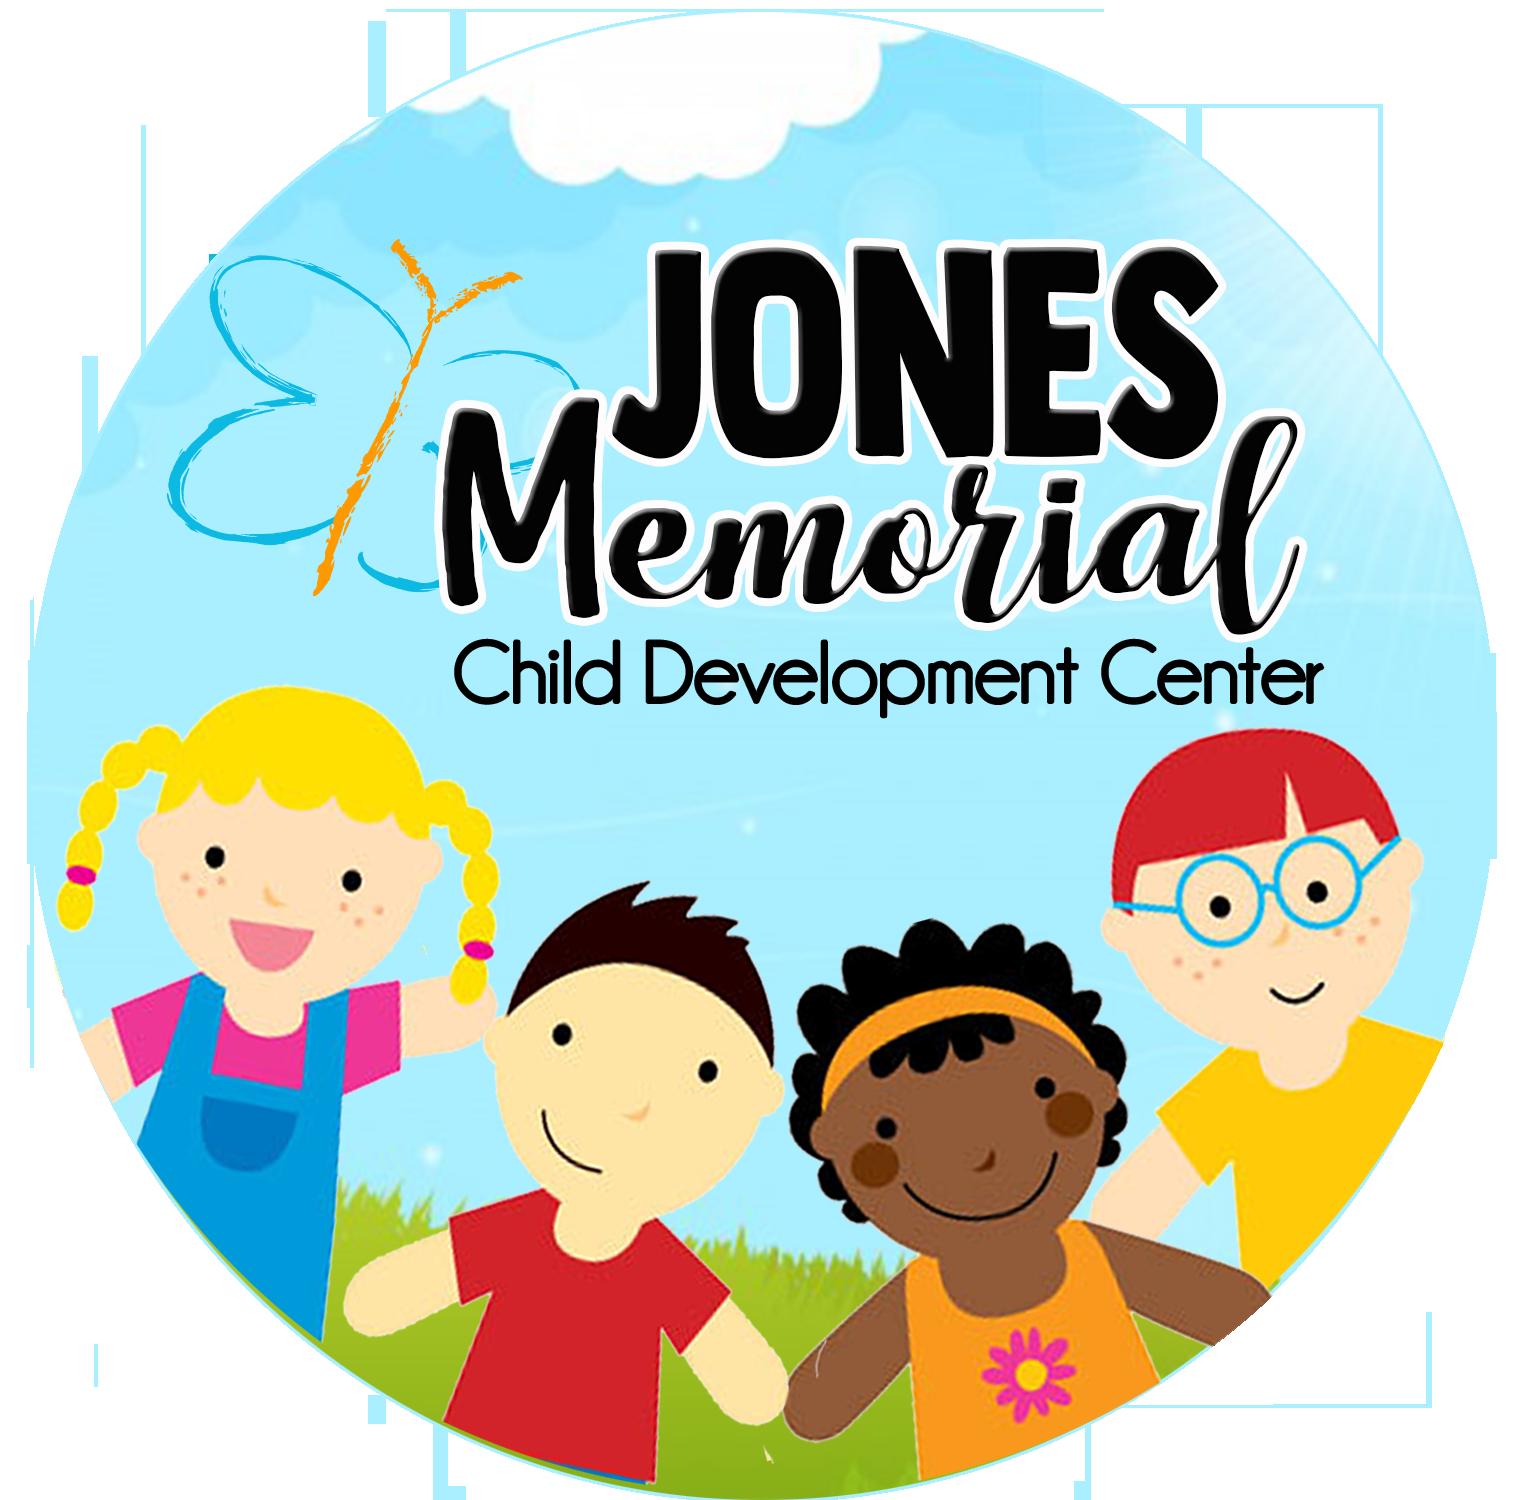 Jones Memorial Child Development Center